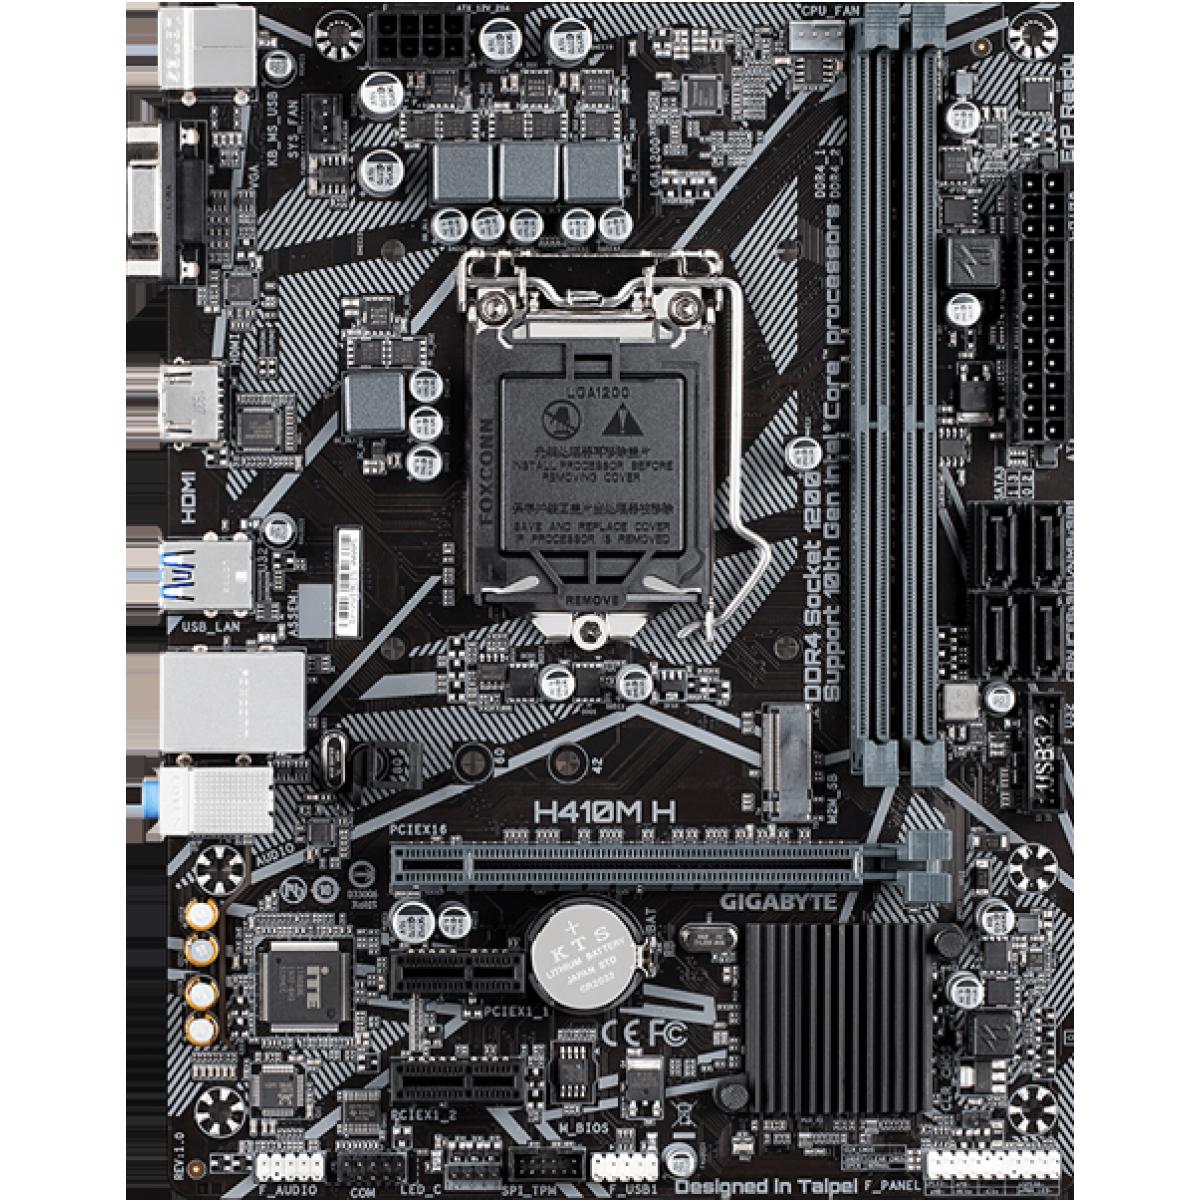 Placa Mãe Gigabyte, H410M-H, Chipset H410, Intel LGA 1200, mATX, DDR4